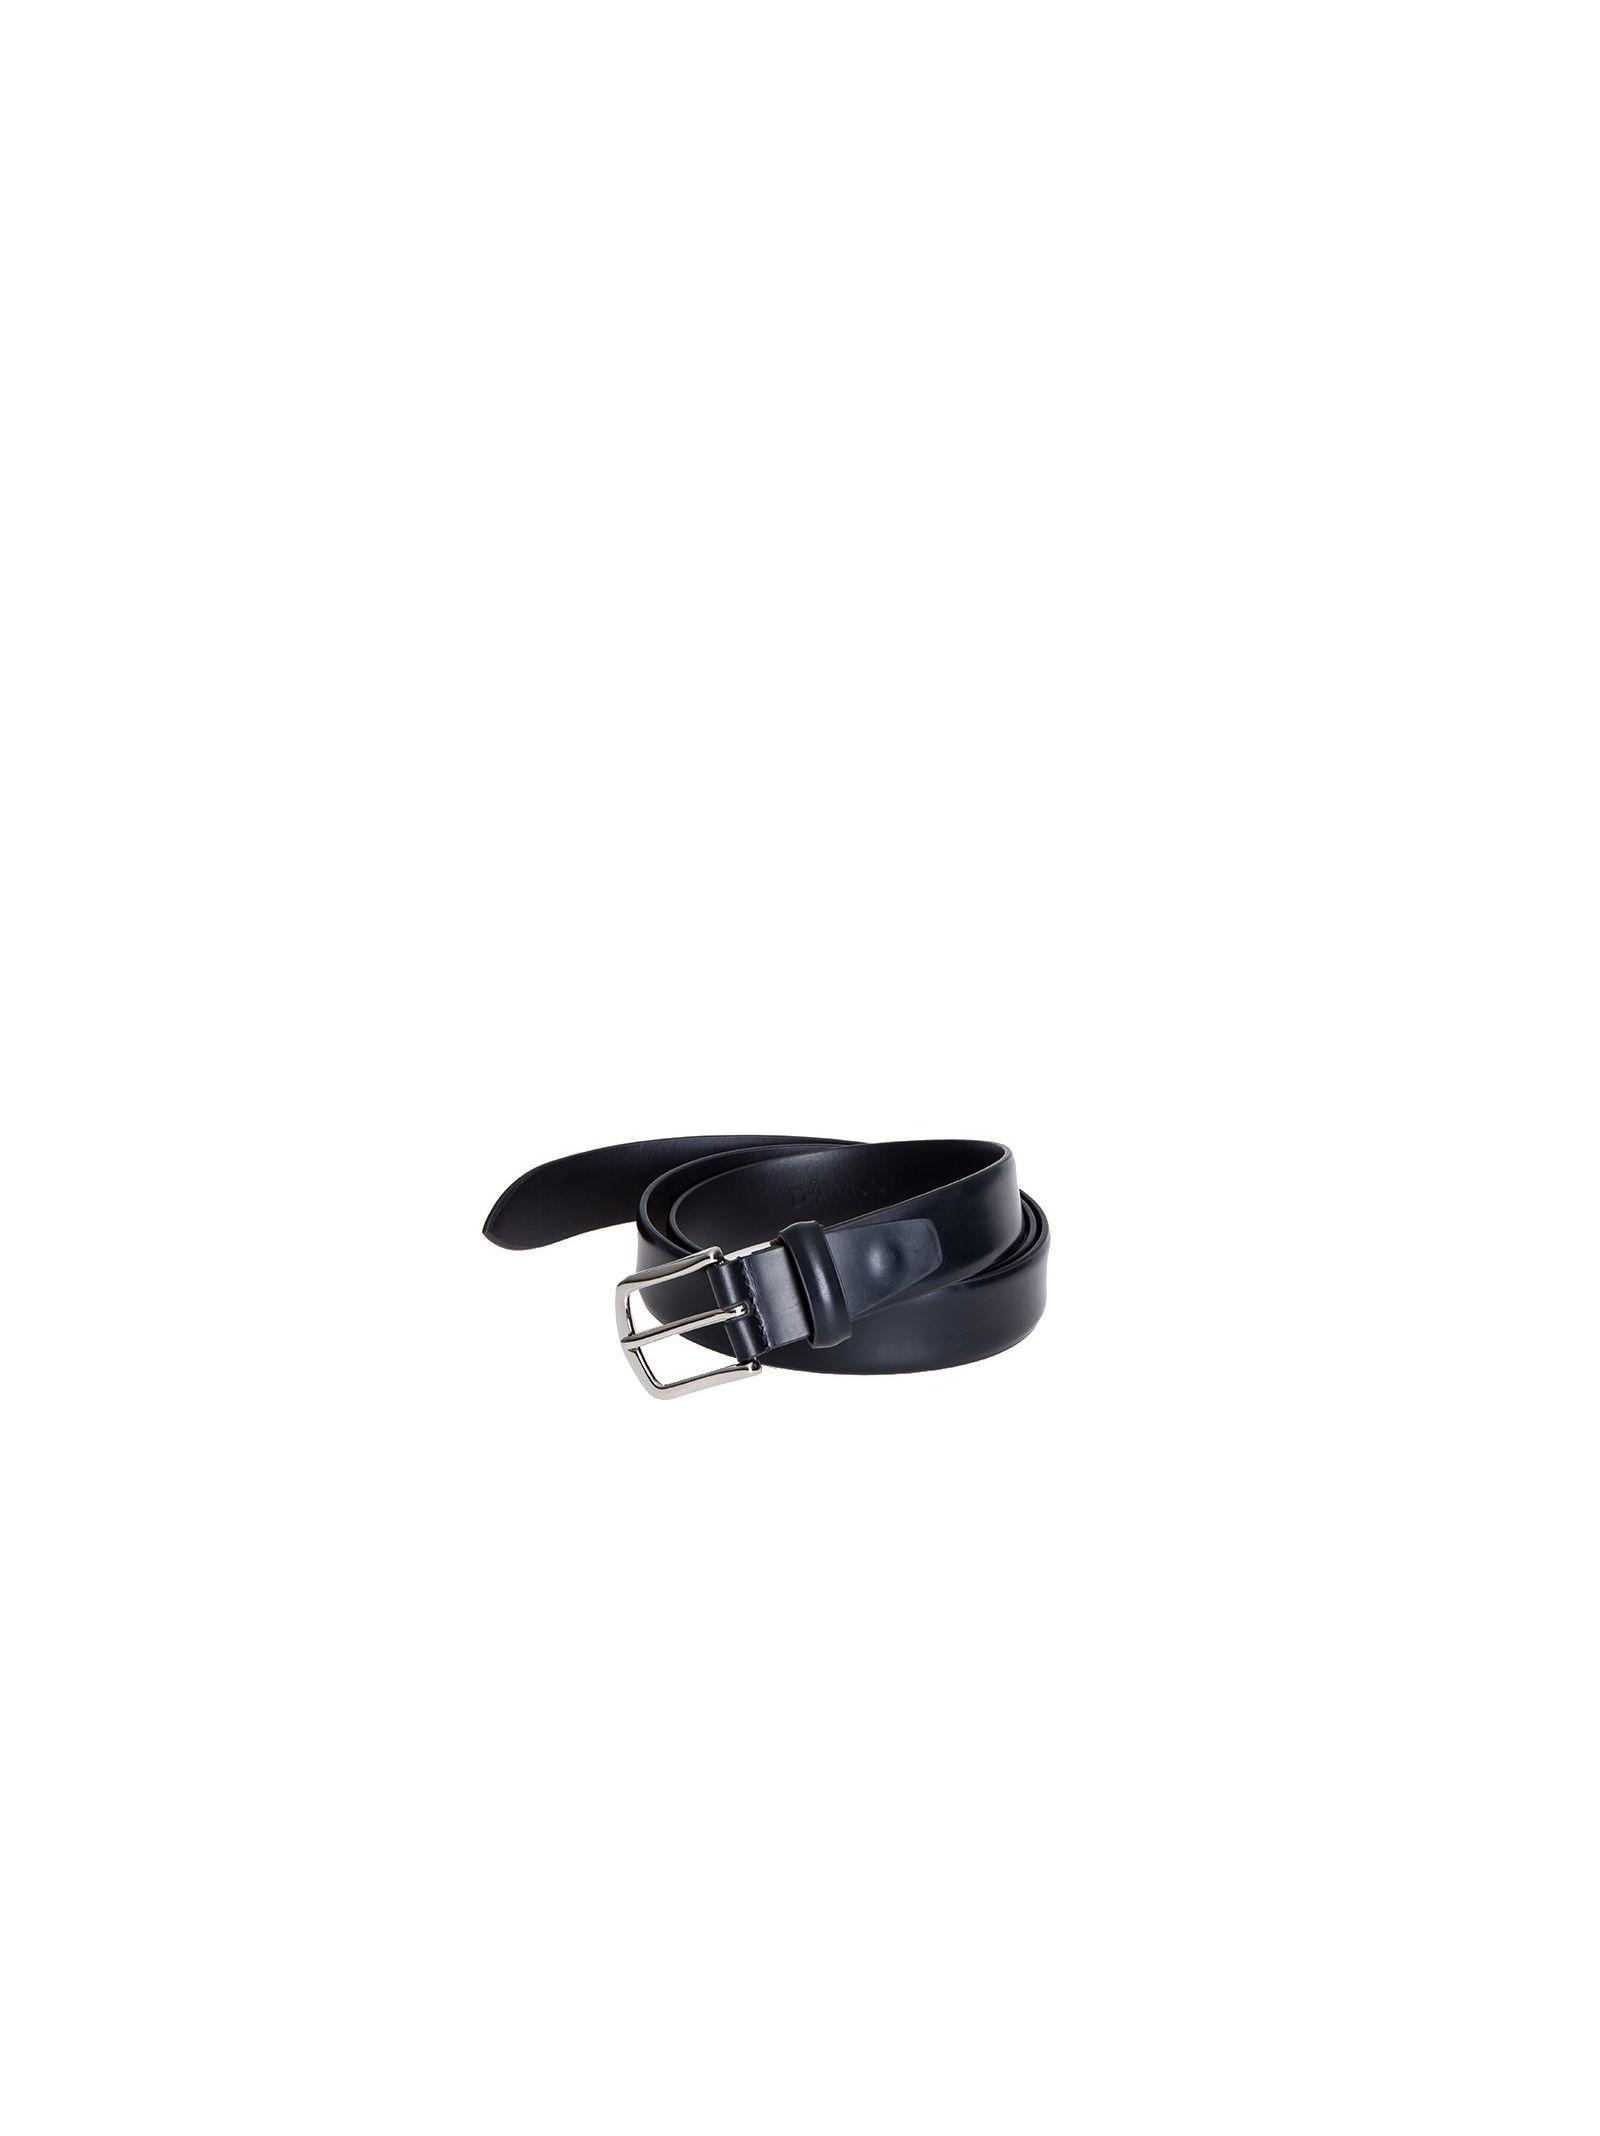 Leather Belt Andrea D'amico Acub072 999